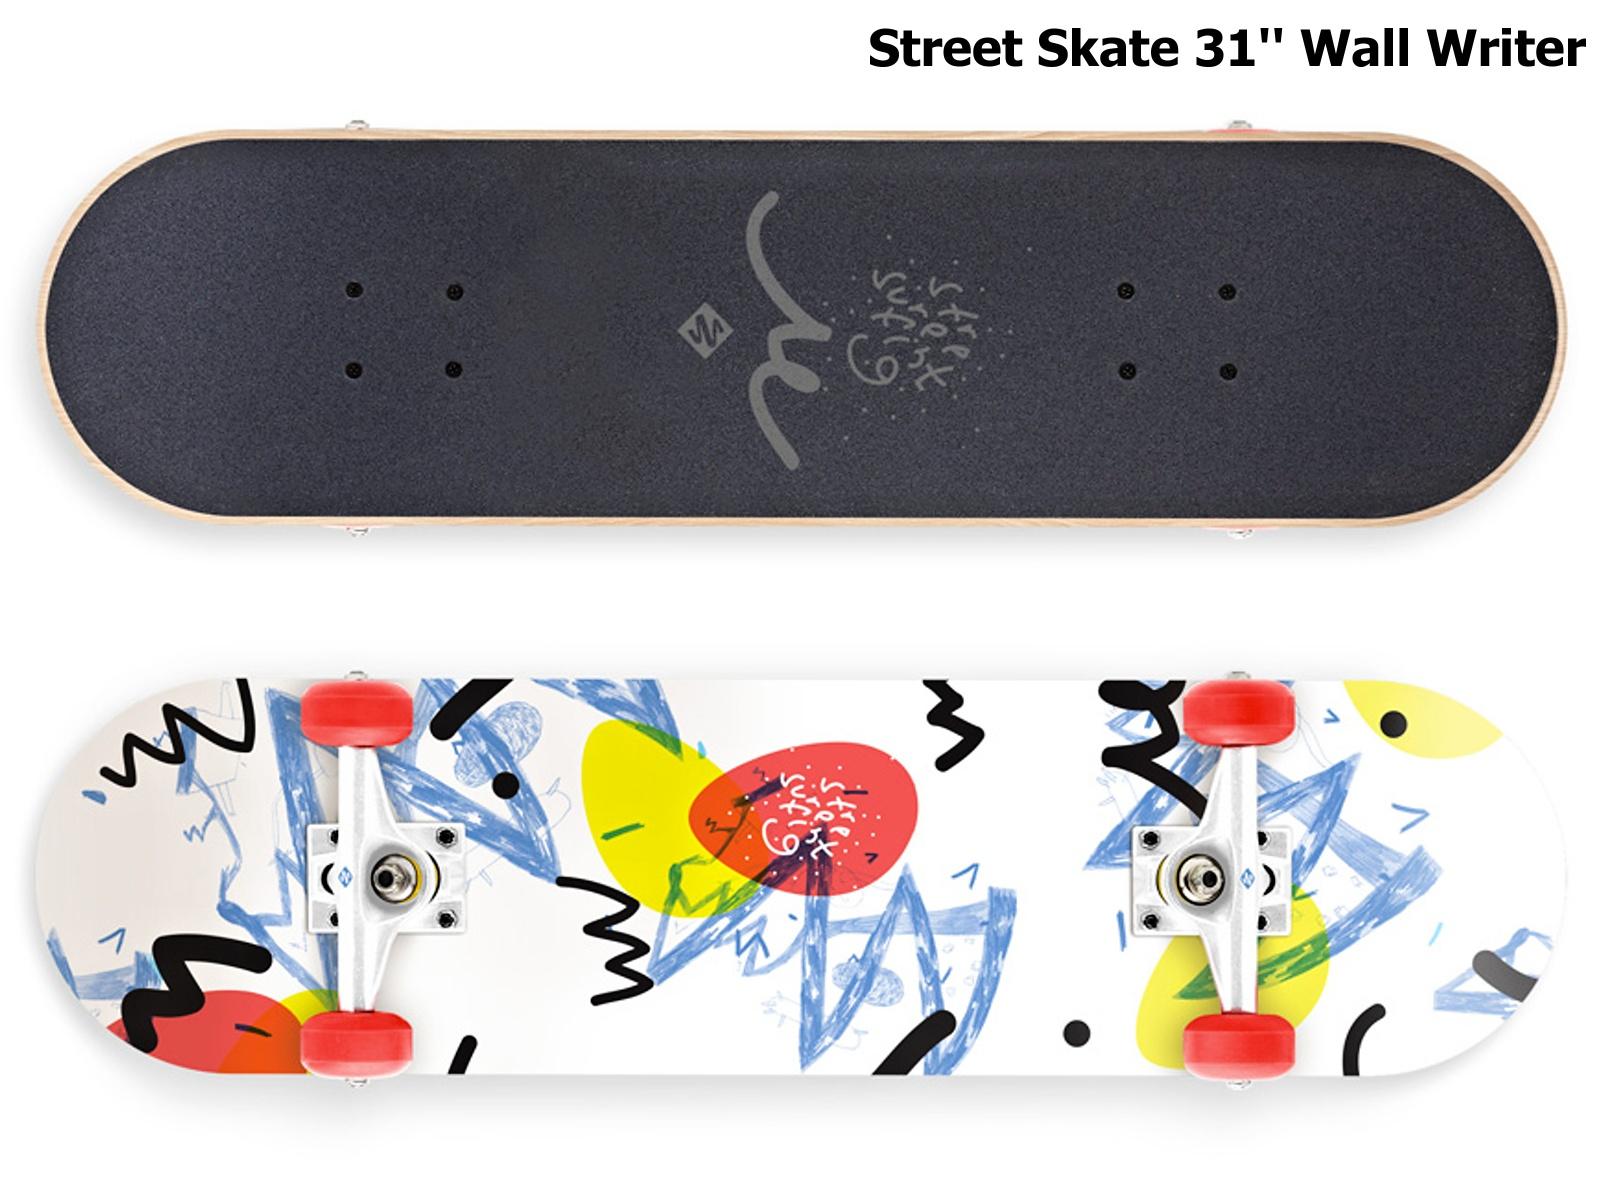 Skateboard STREET SURFING Street Skate 31'' Wall Writer